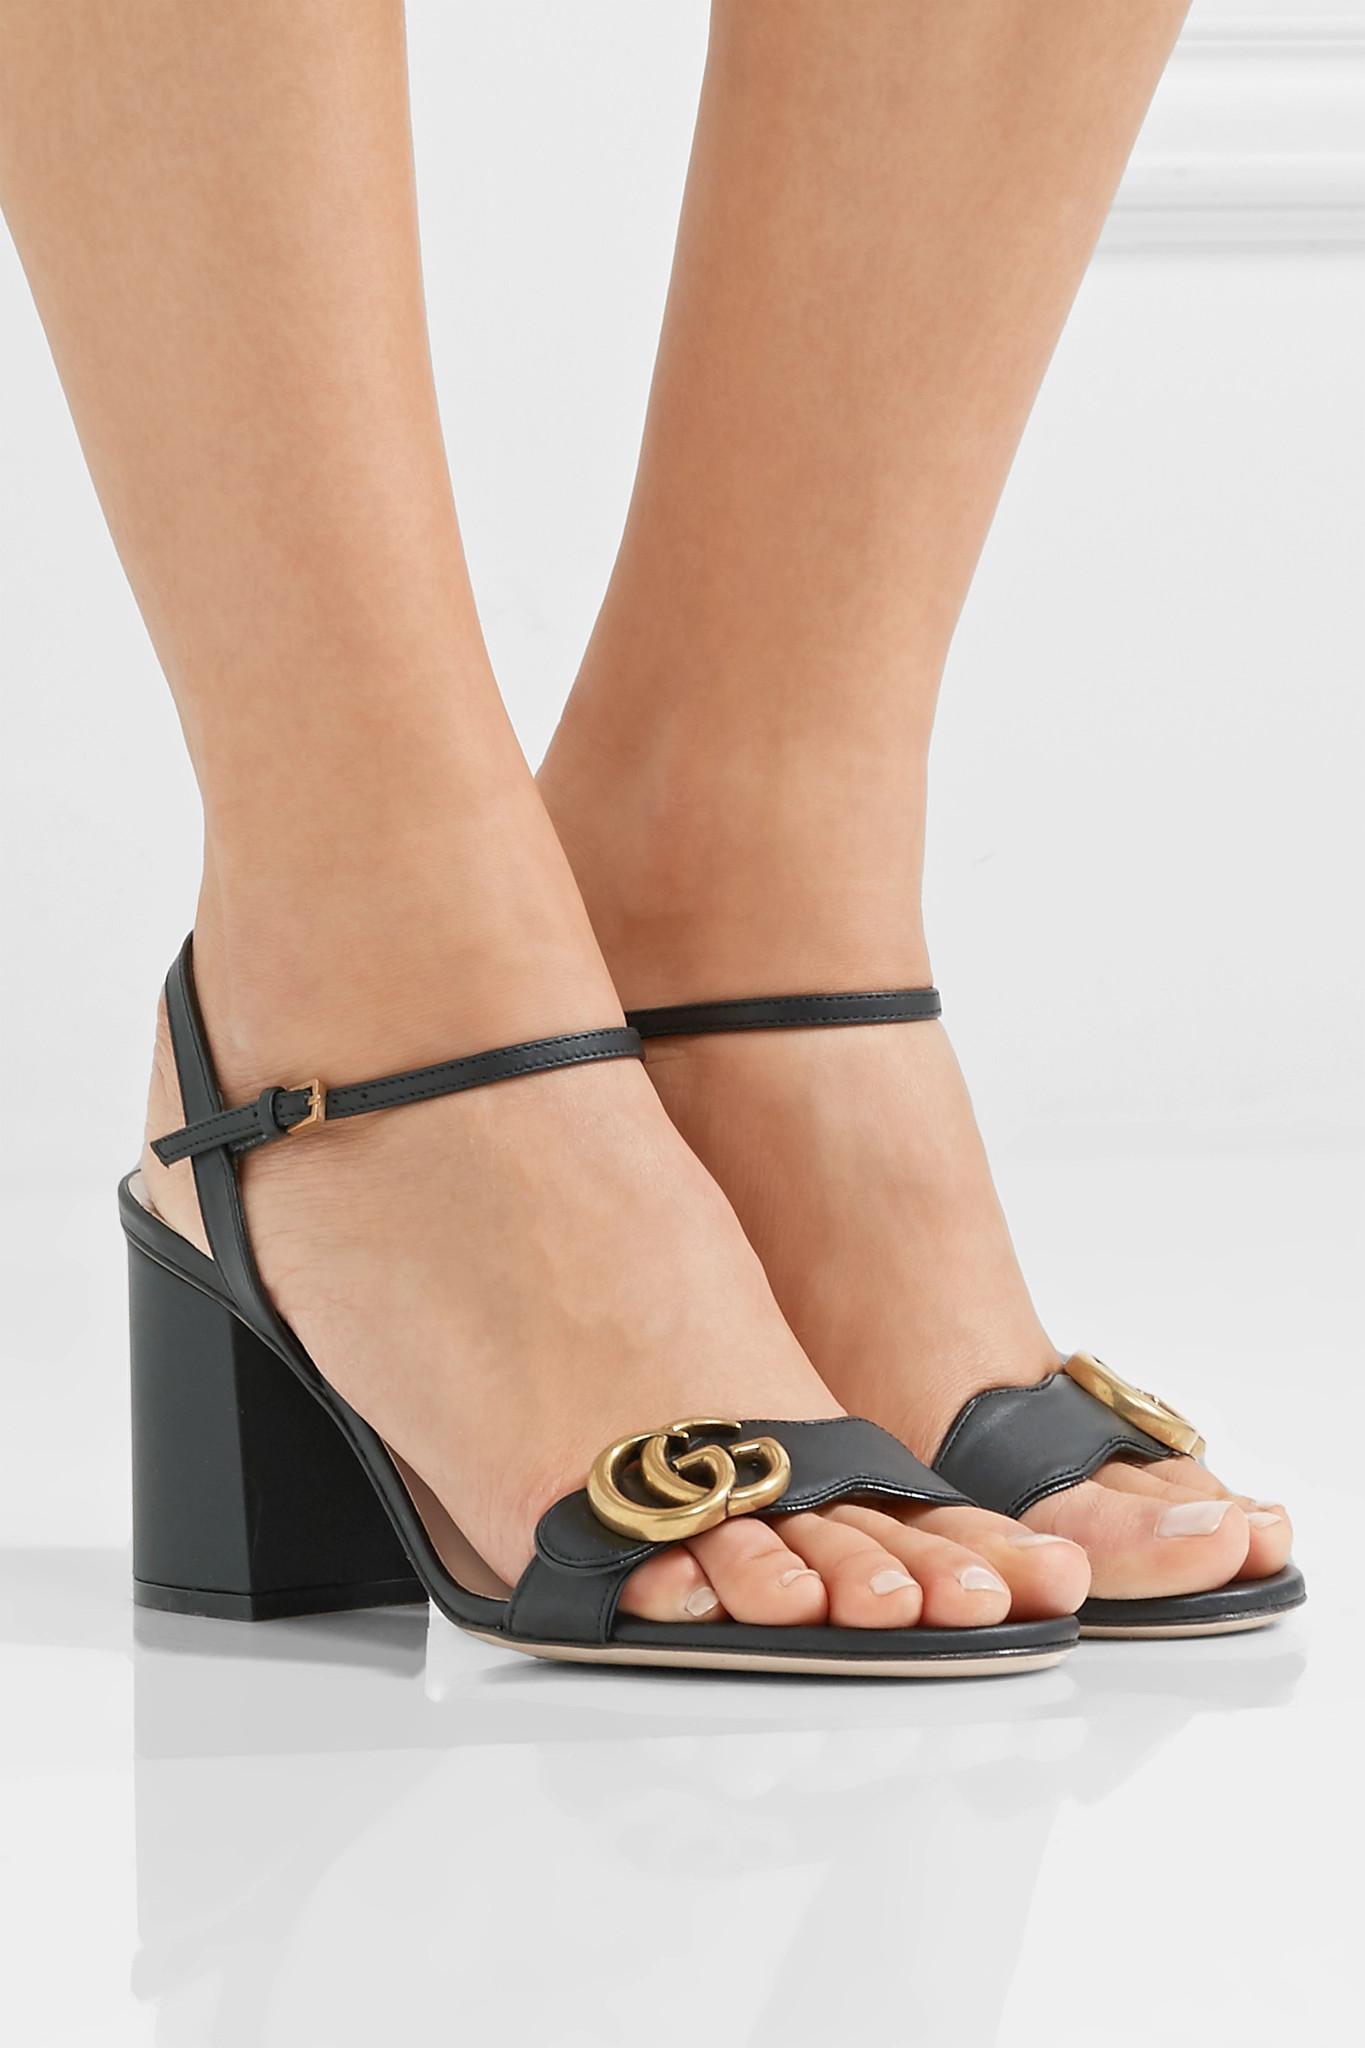 f5879bd49ef7 Lyst - Gucci Marmont Embellished Leather Sandals in Black - Save 1%